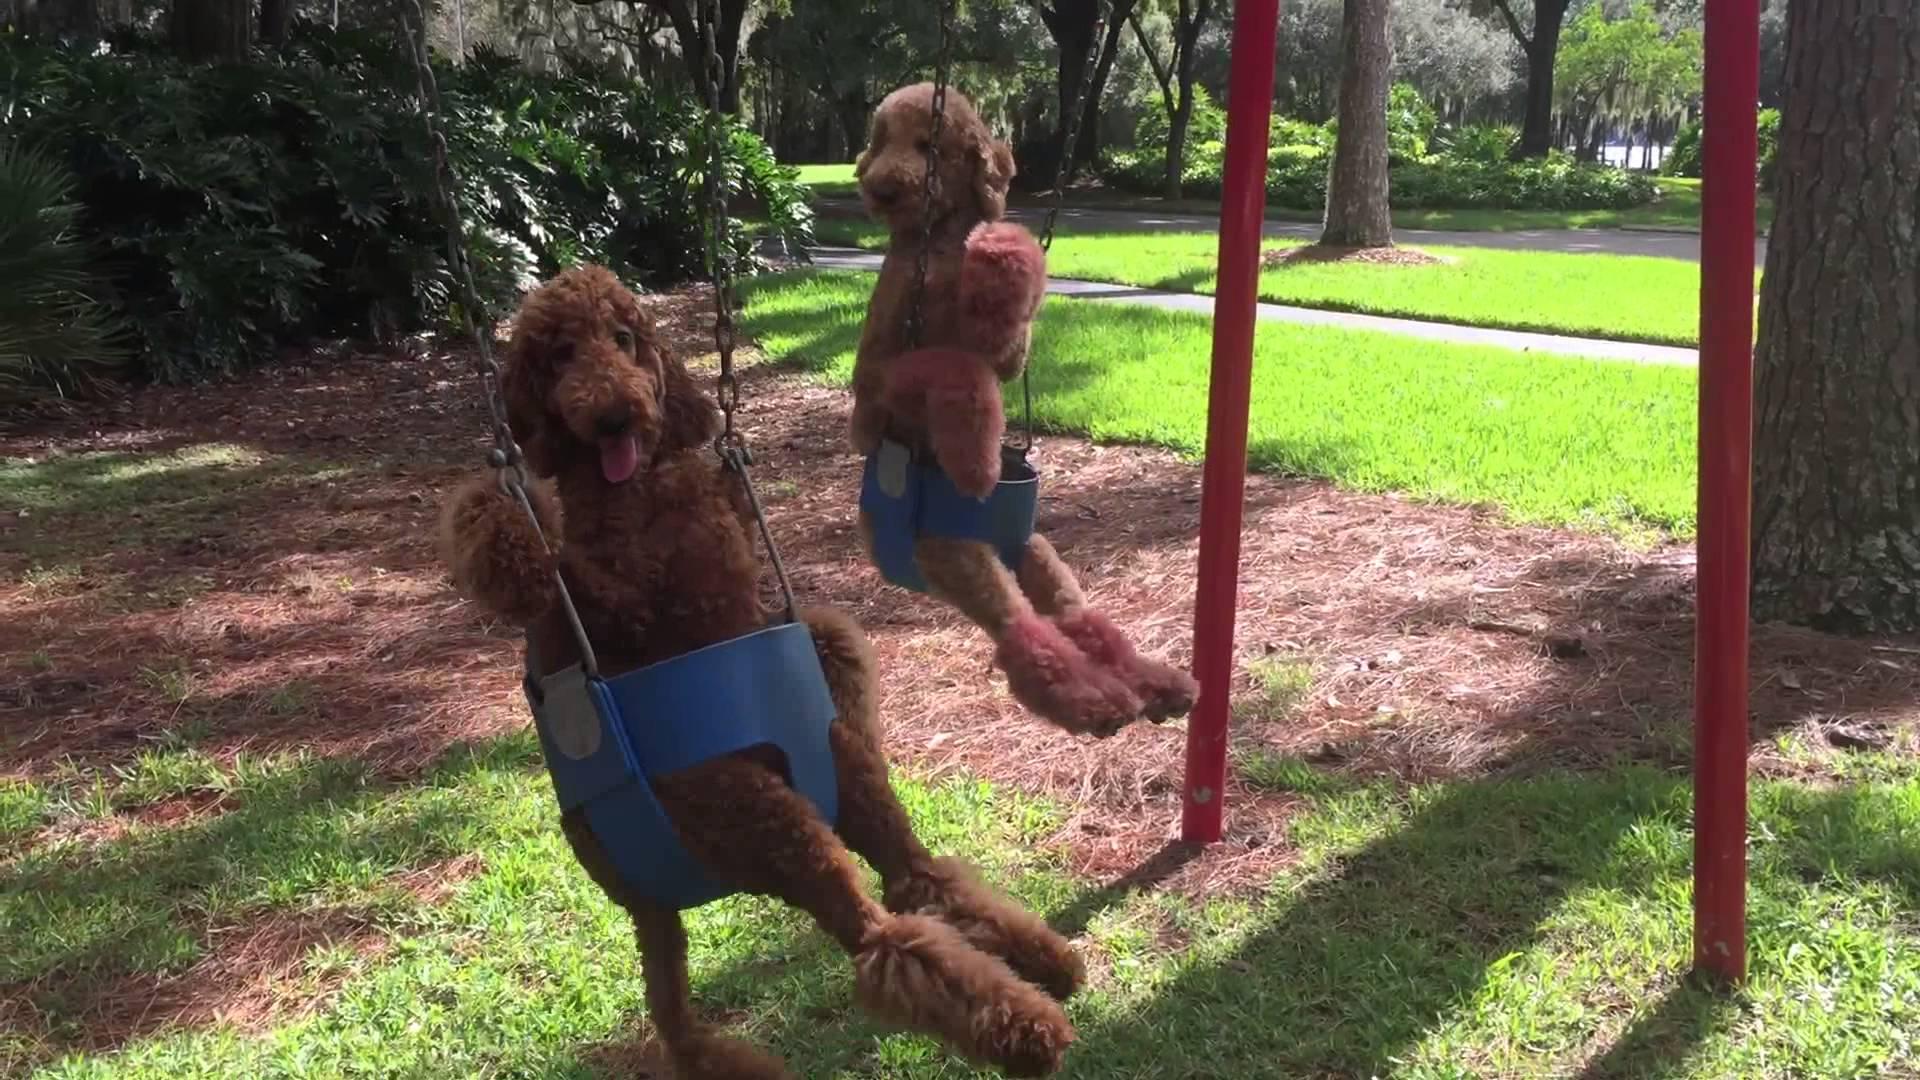 dog date in a park